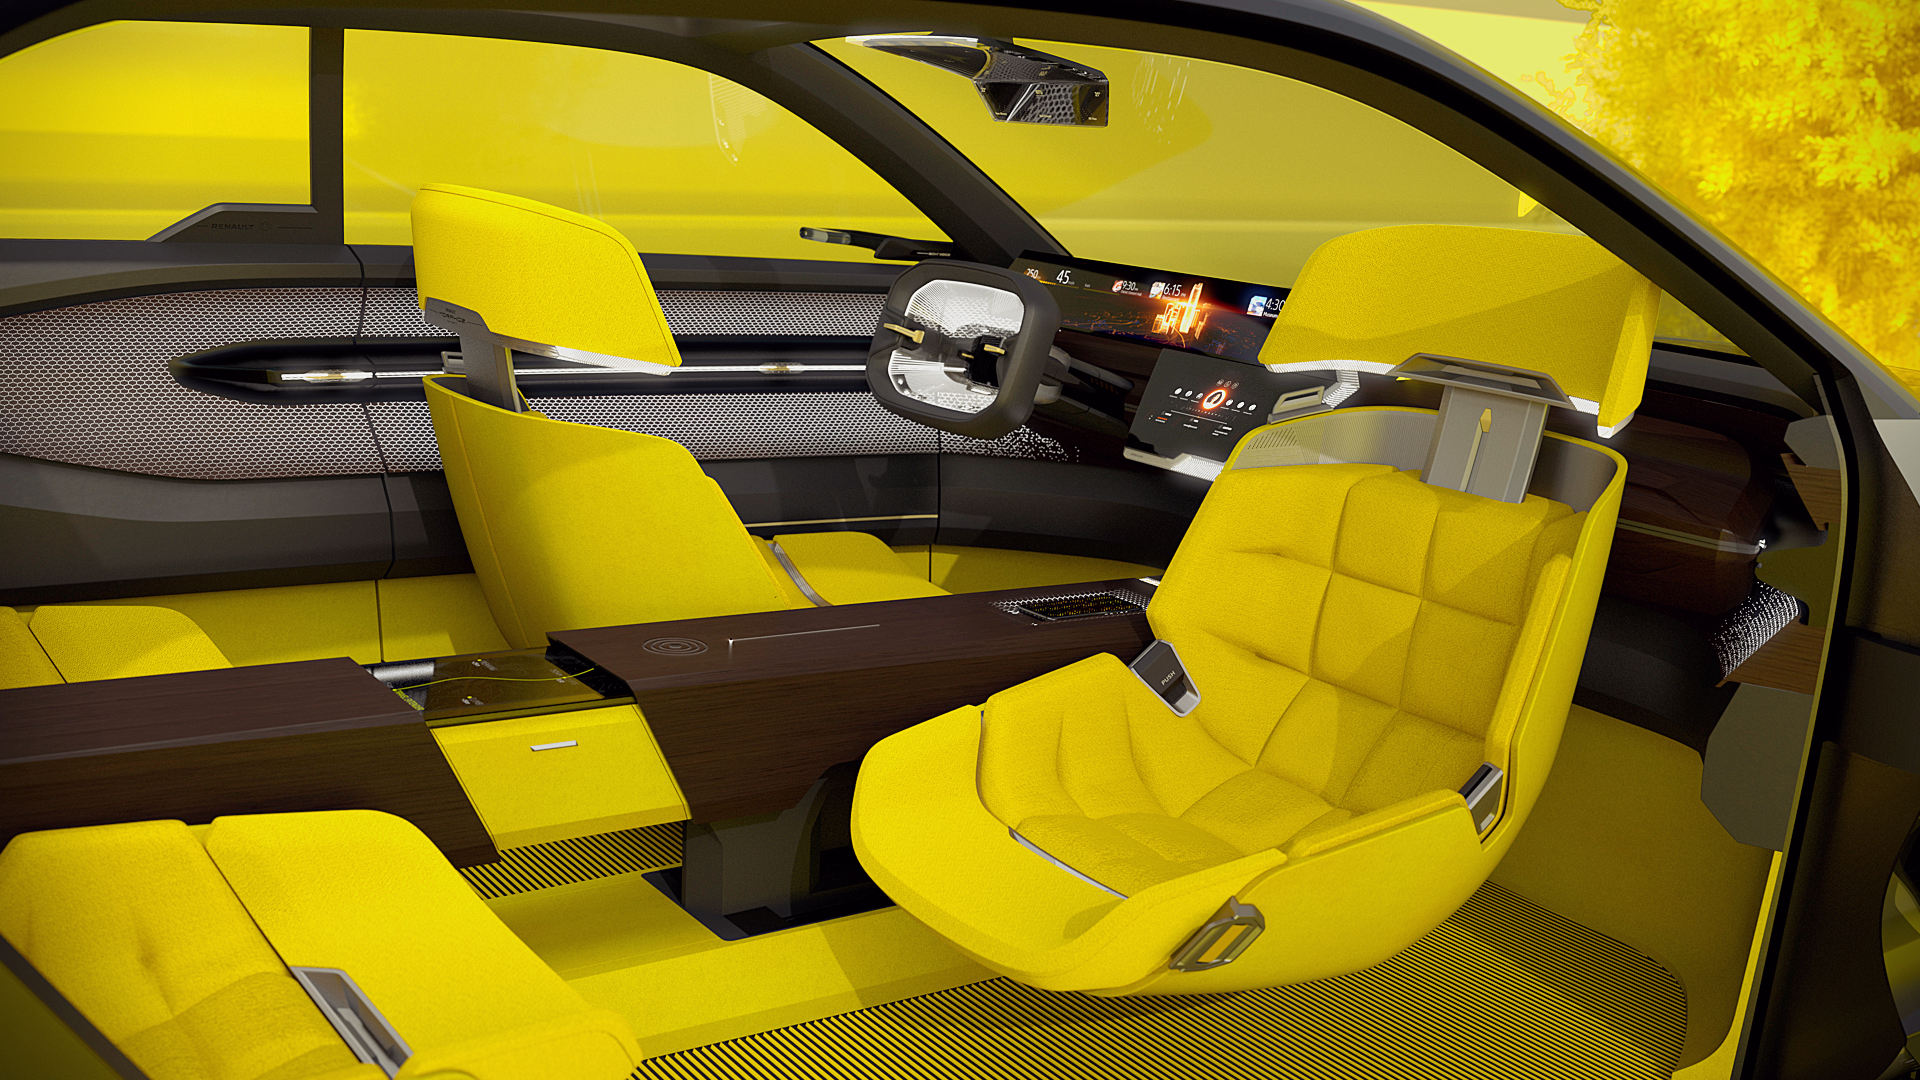 Renault Morphoz 2020 Interior Seats Wallpaper